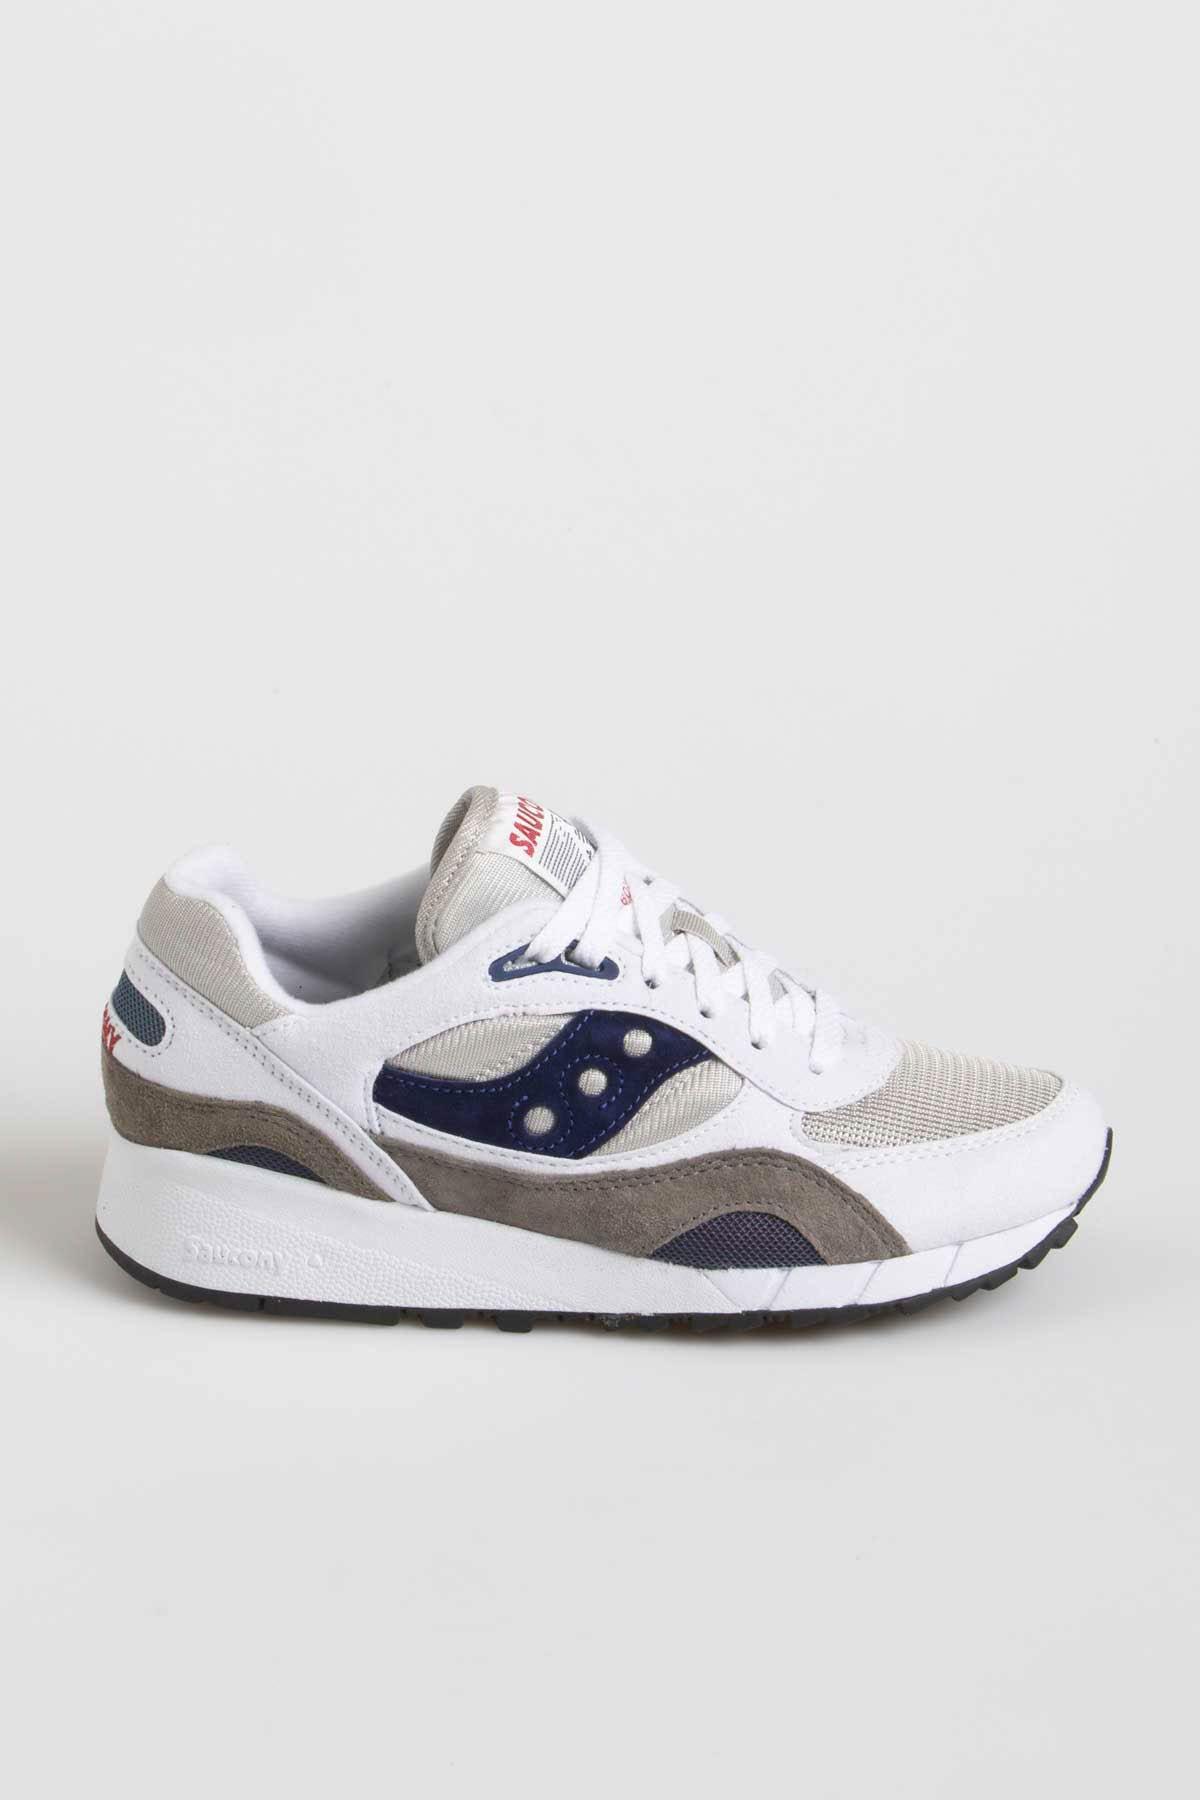 saucony shadow 6000 running shoes zalando